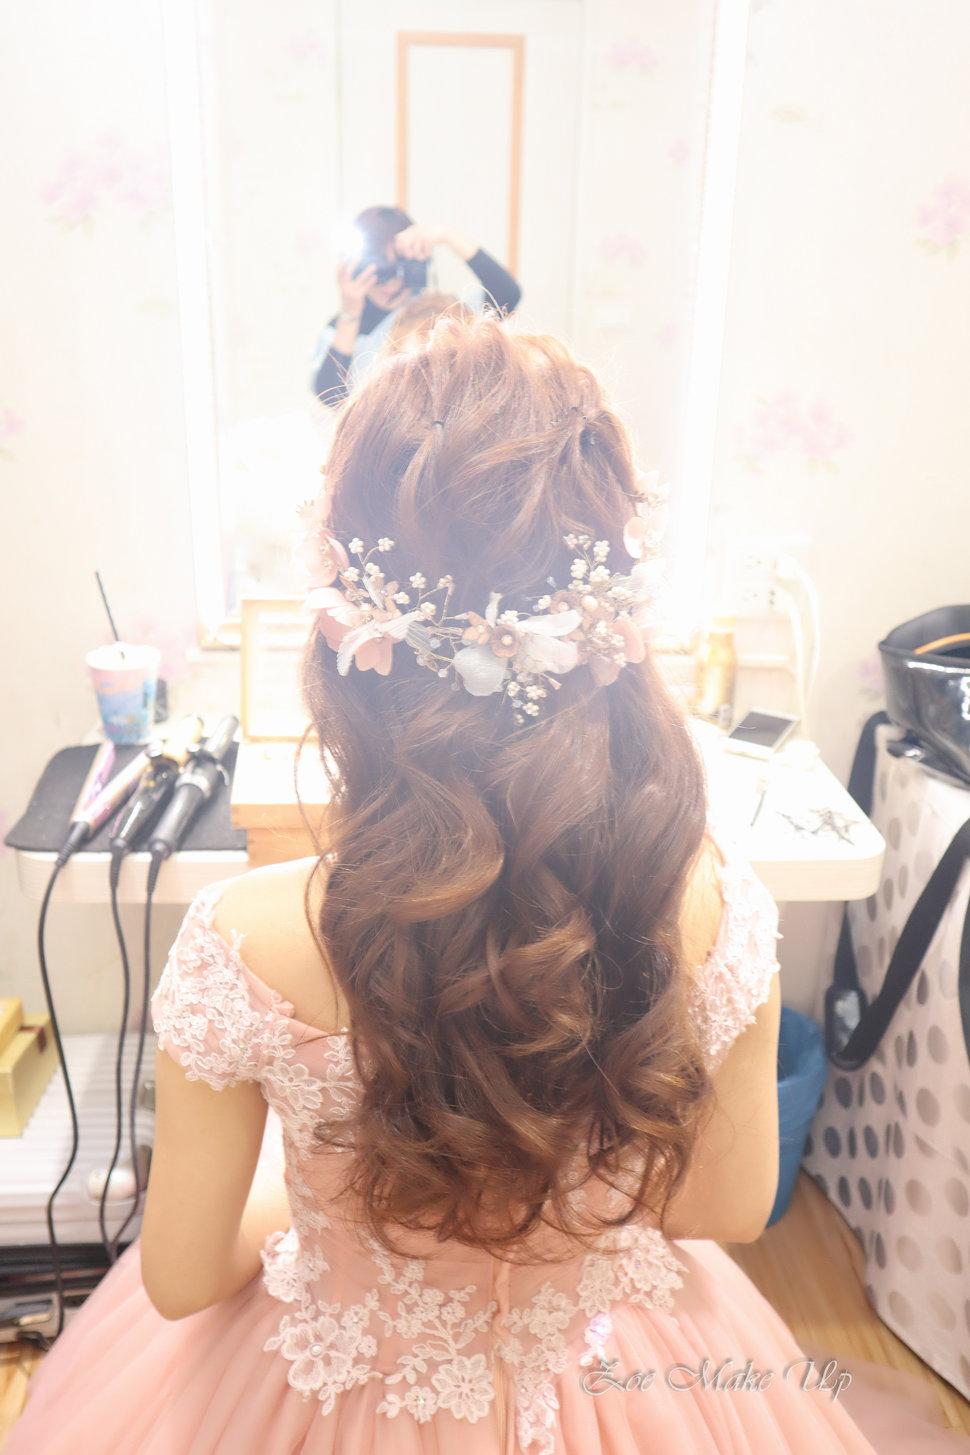 IMG_1260修 - Zoe 幸福時分 新娘秘書《結婚吧》